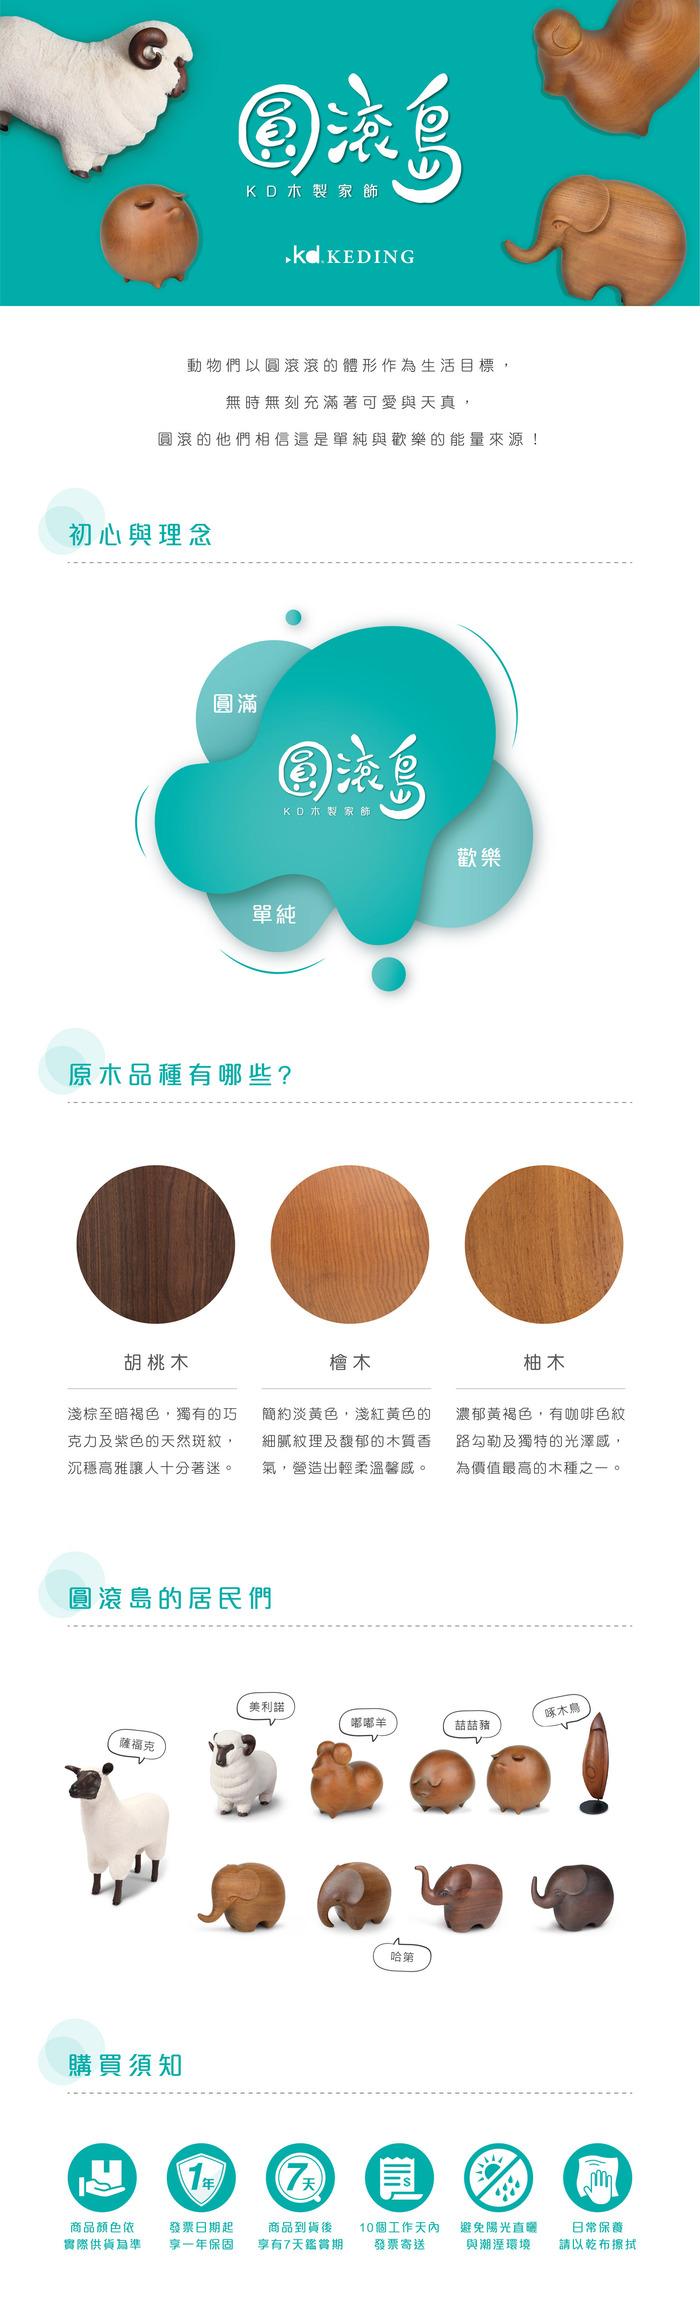 KD|木製家飾 嘟嘟羊 (小)